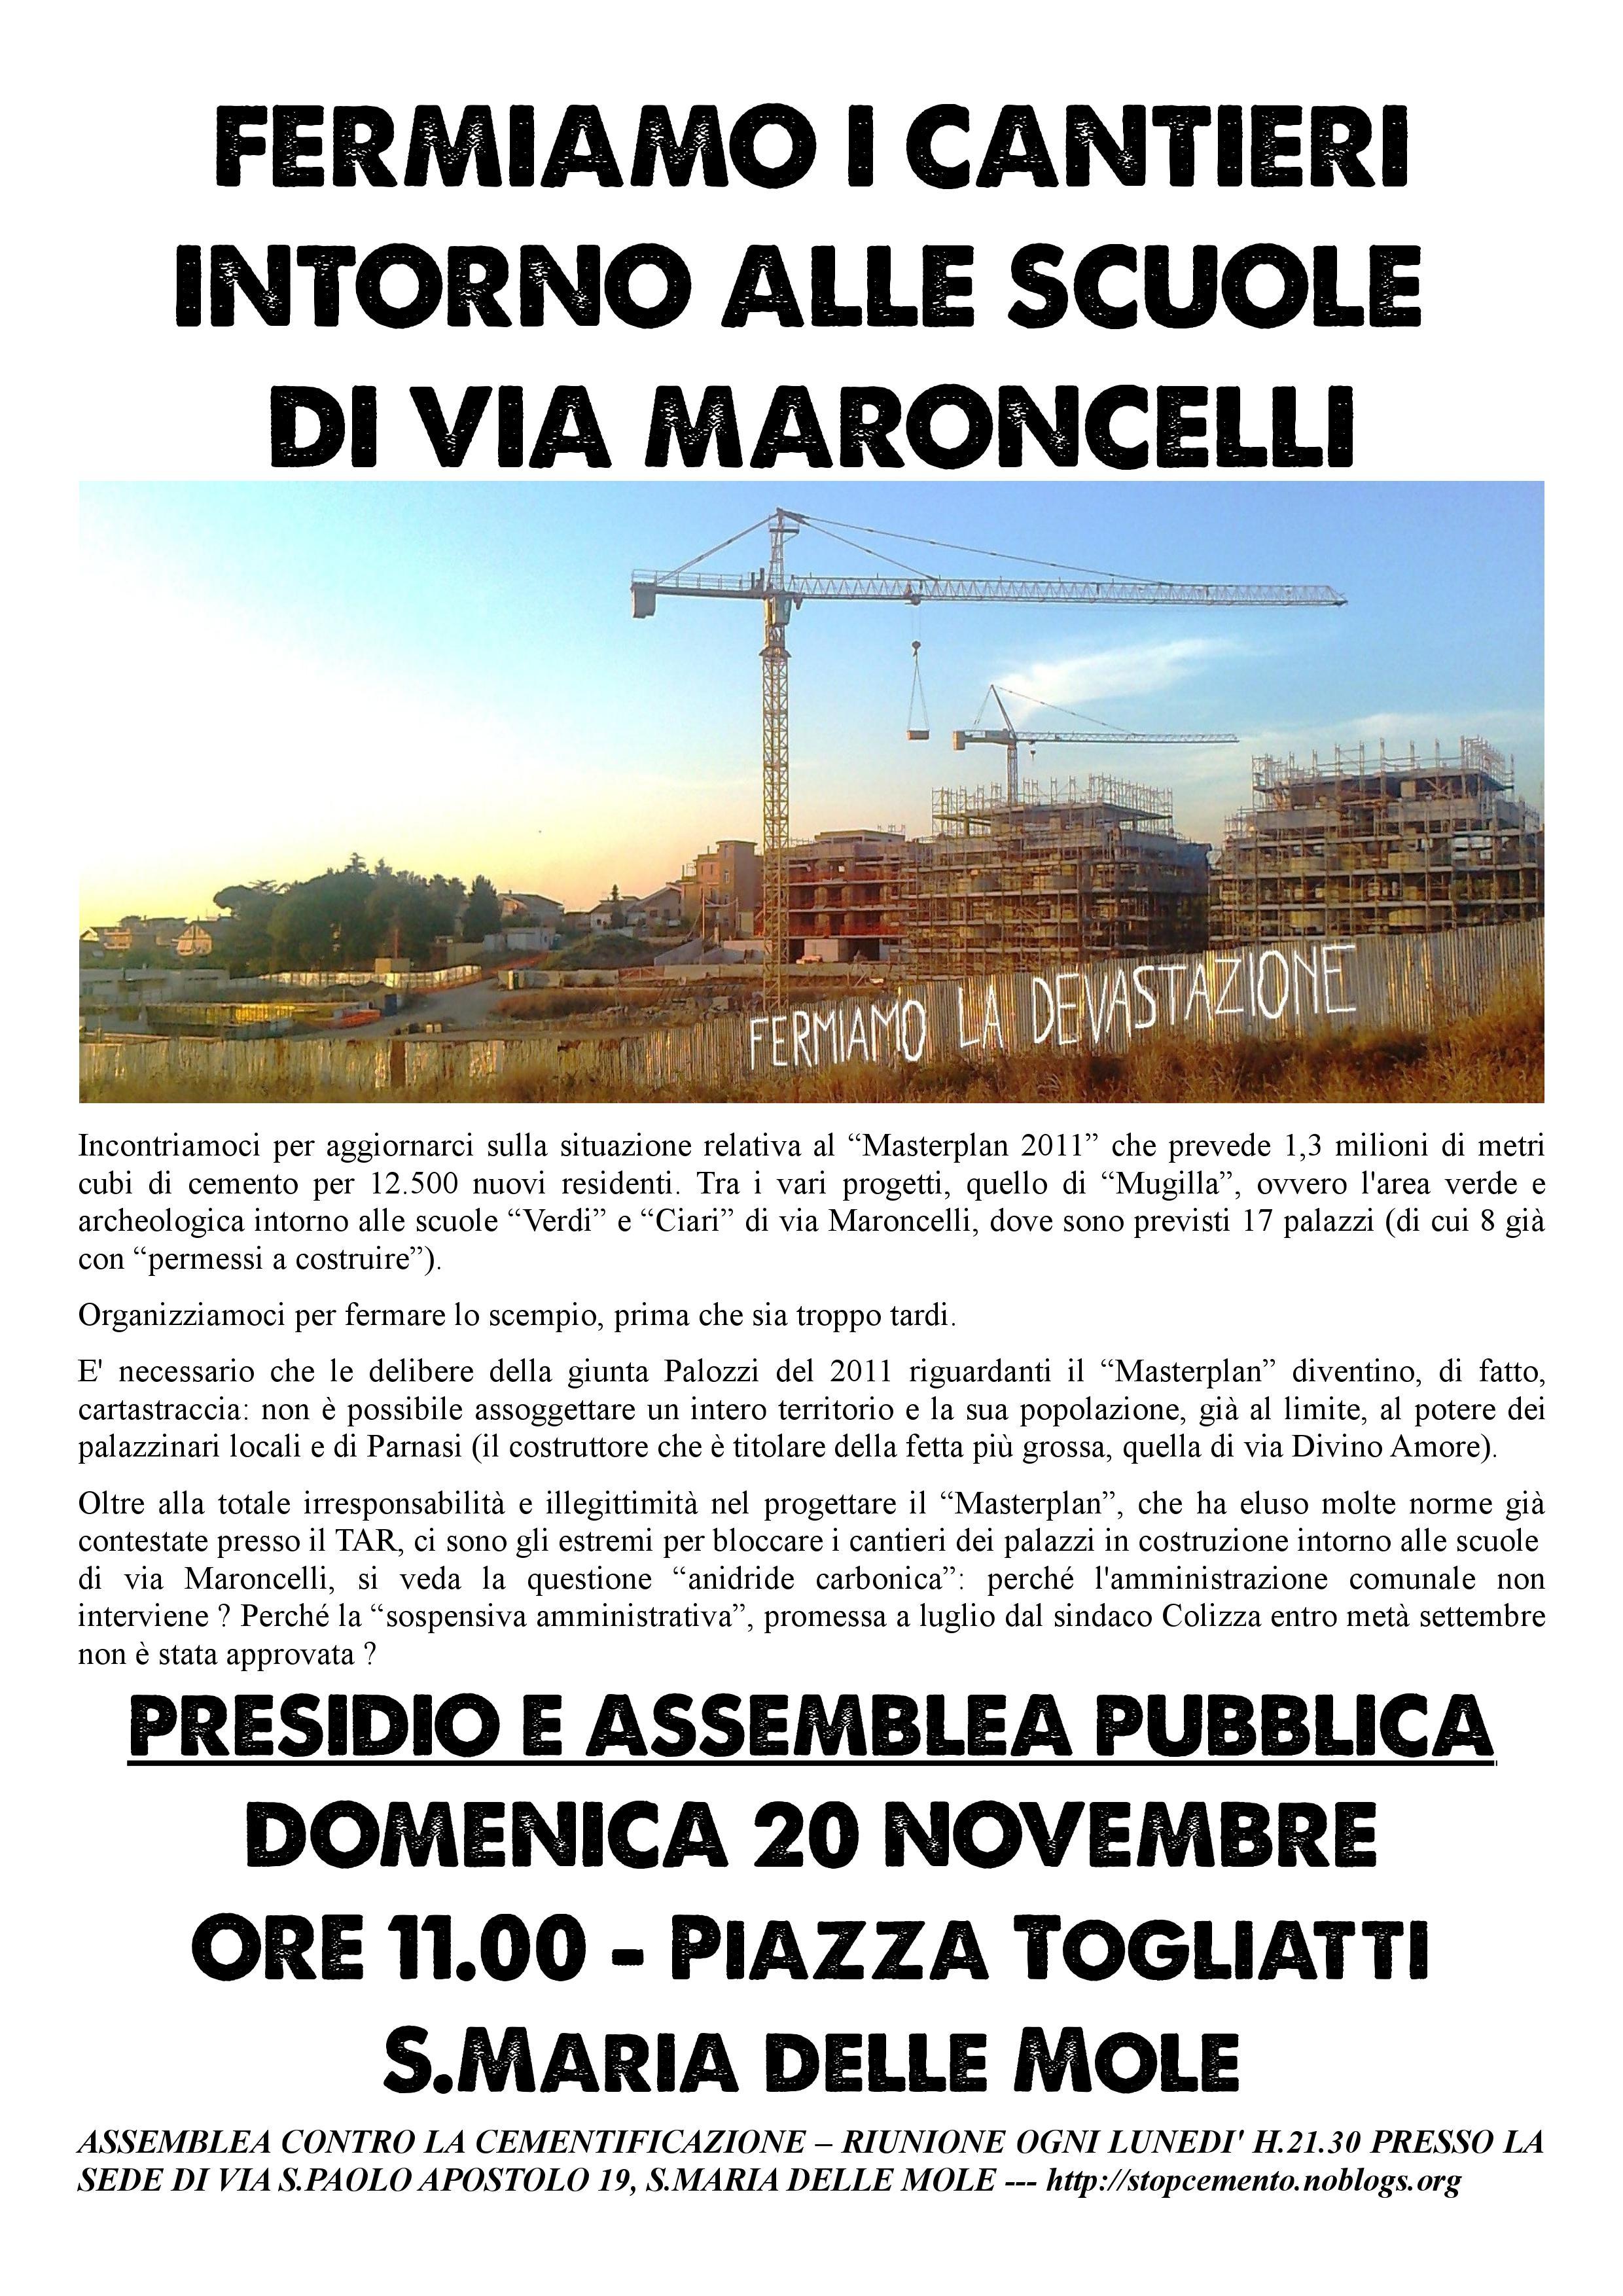 locandina-per-assemblea-publbica-20-novembre-in-piazza-a-s-maria-def